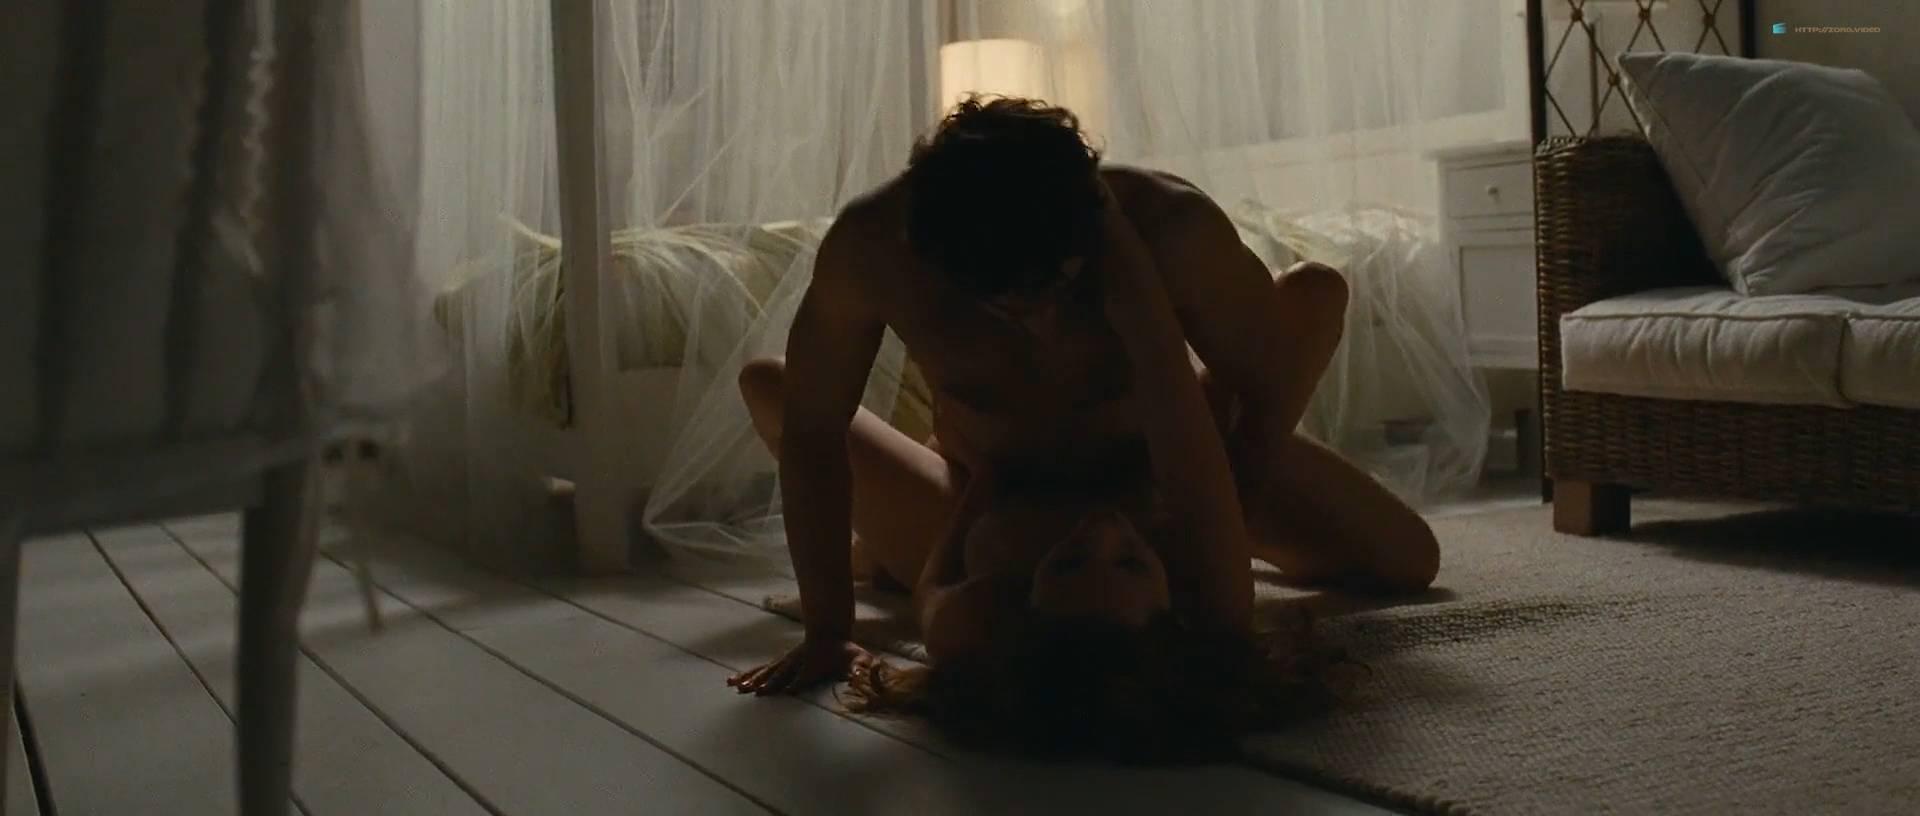 Louise Bourgoin nude and pregnant in - Unheureux événement (FR-2011) HD 1080p (2)